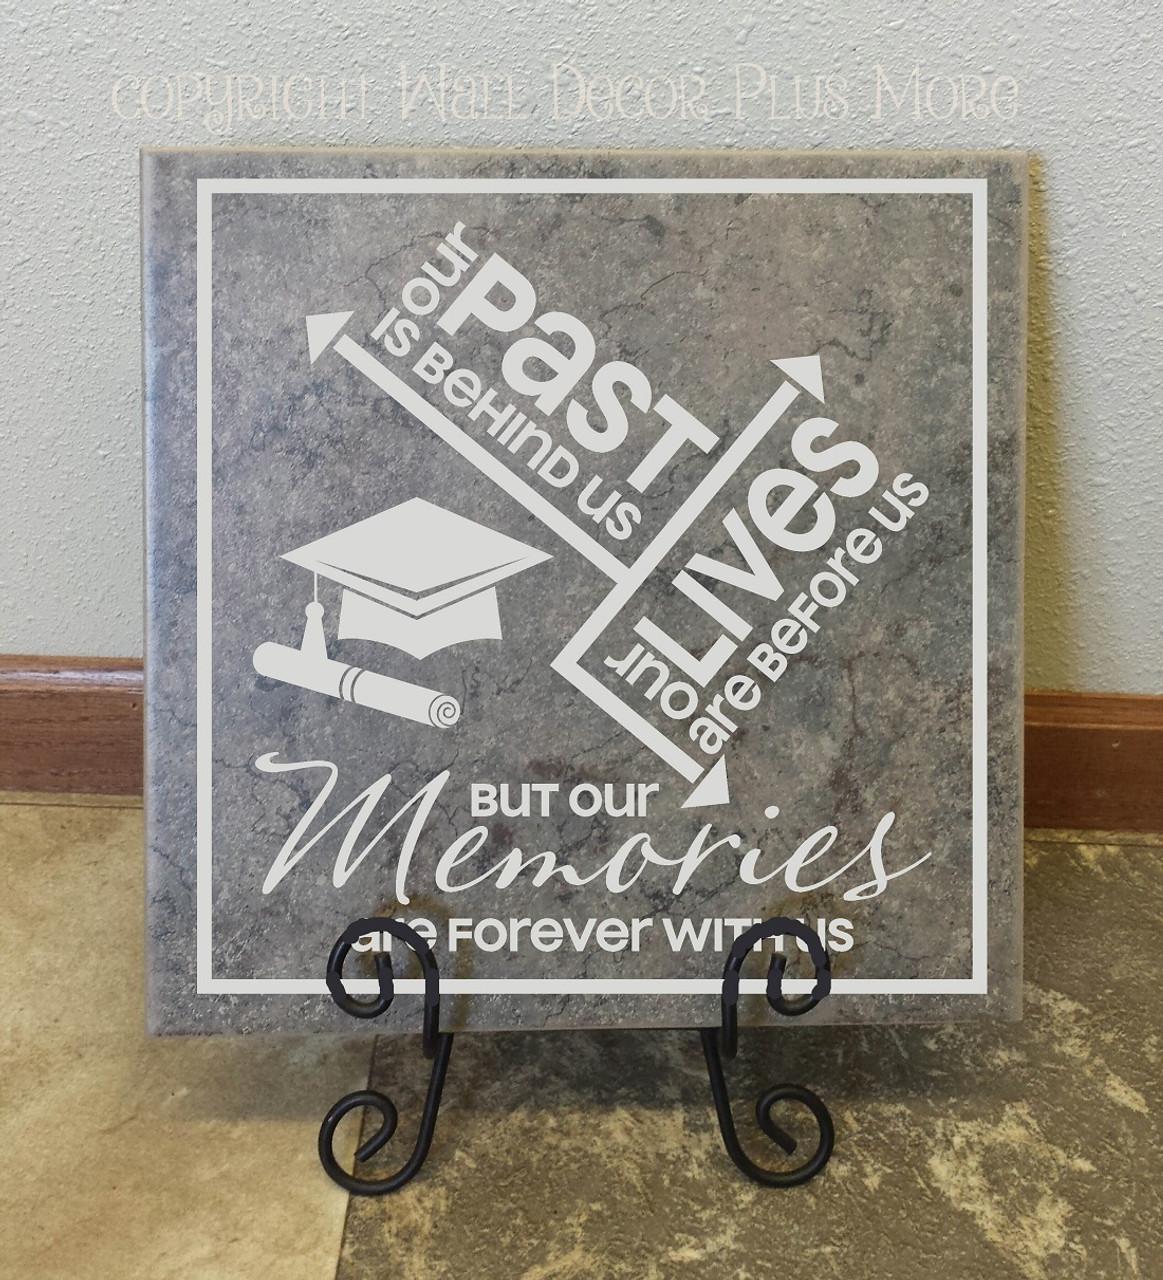 graduation quote vinyl sticker past behind us memories forever